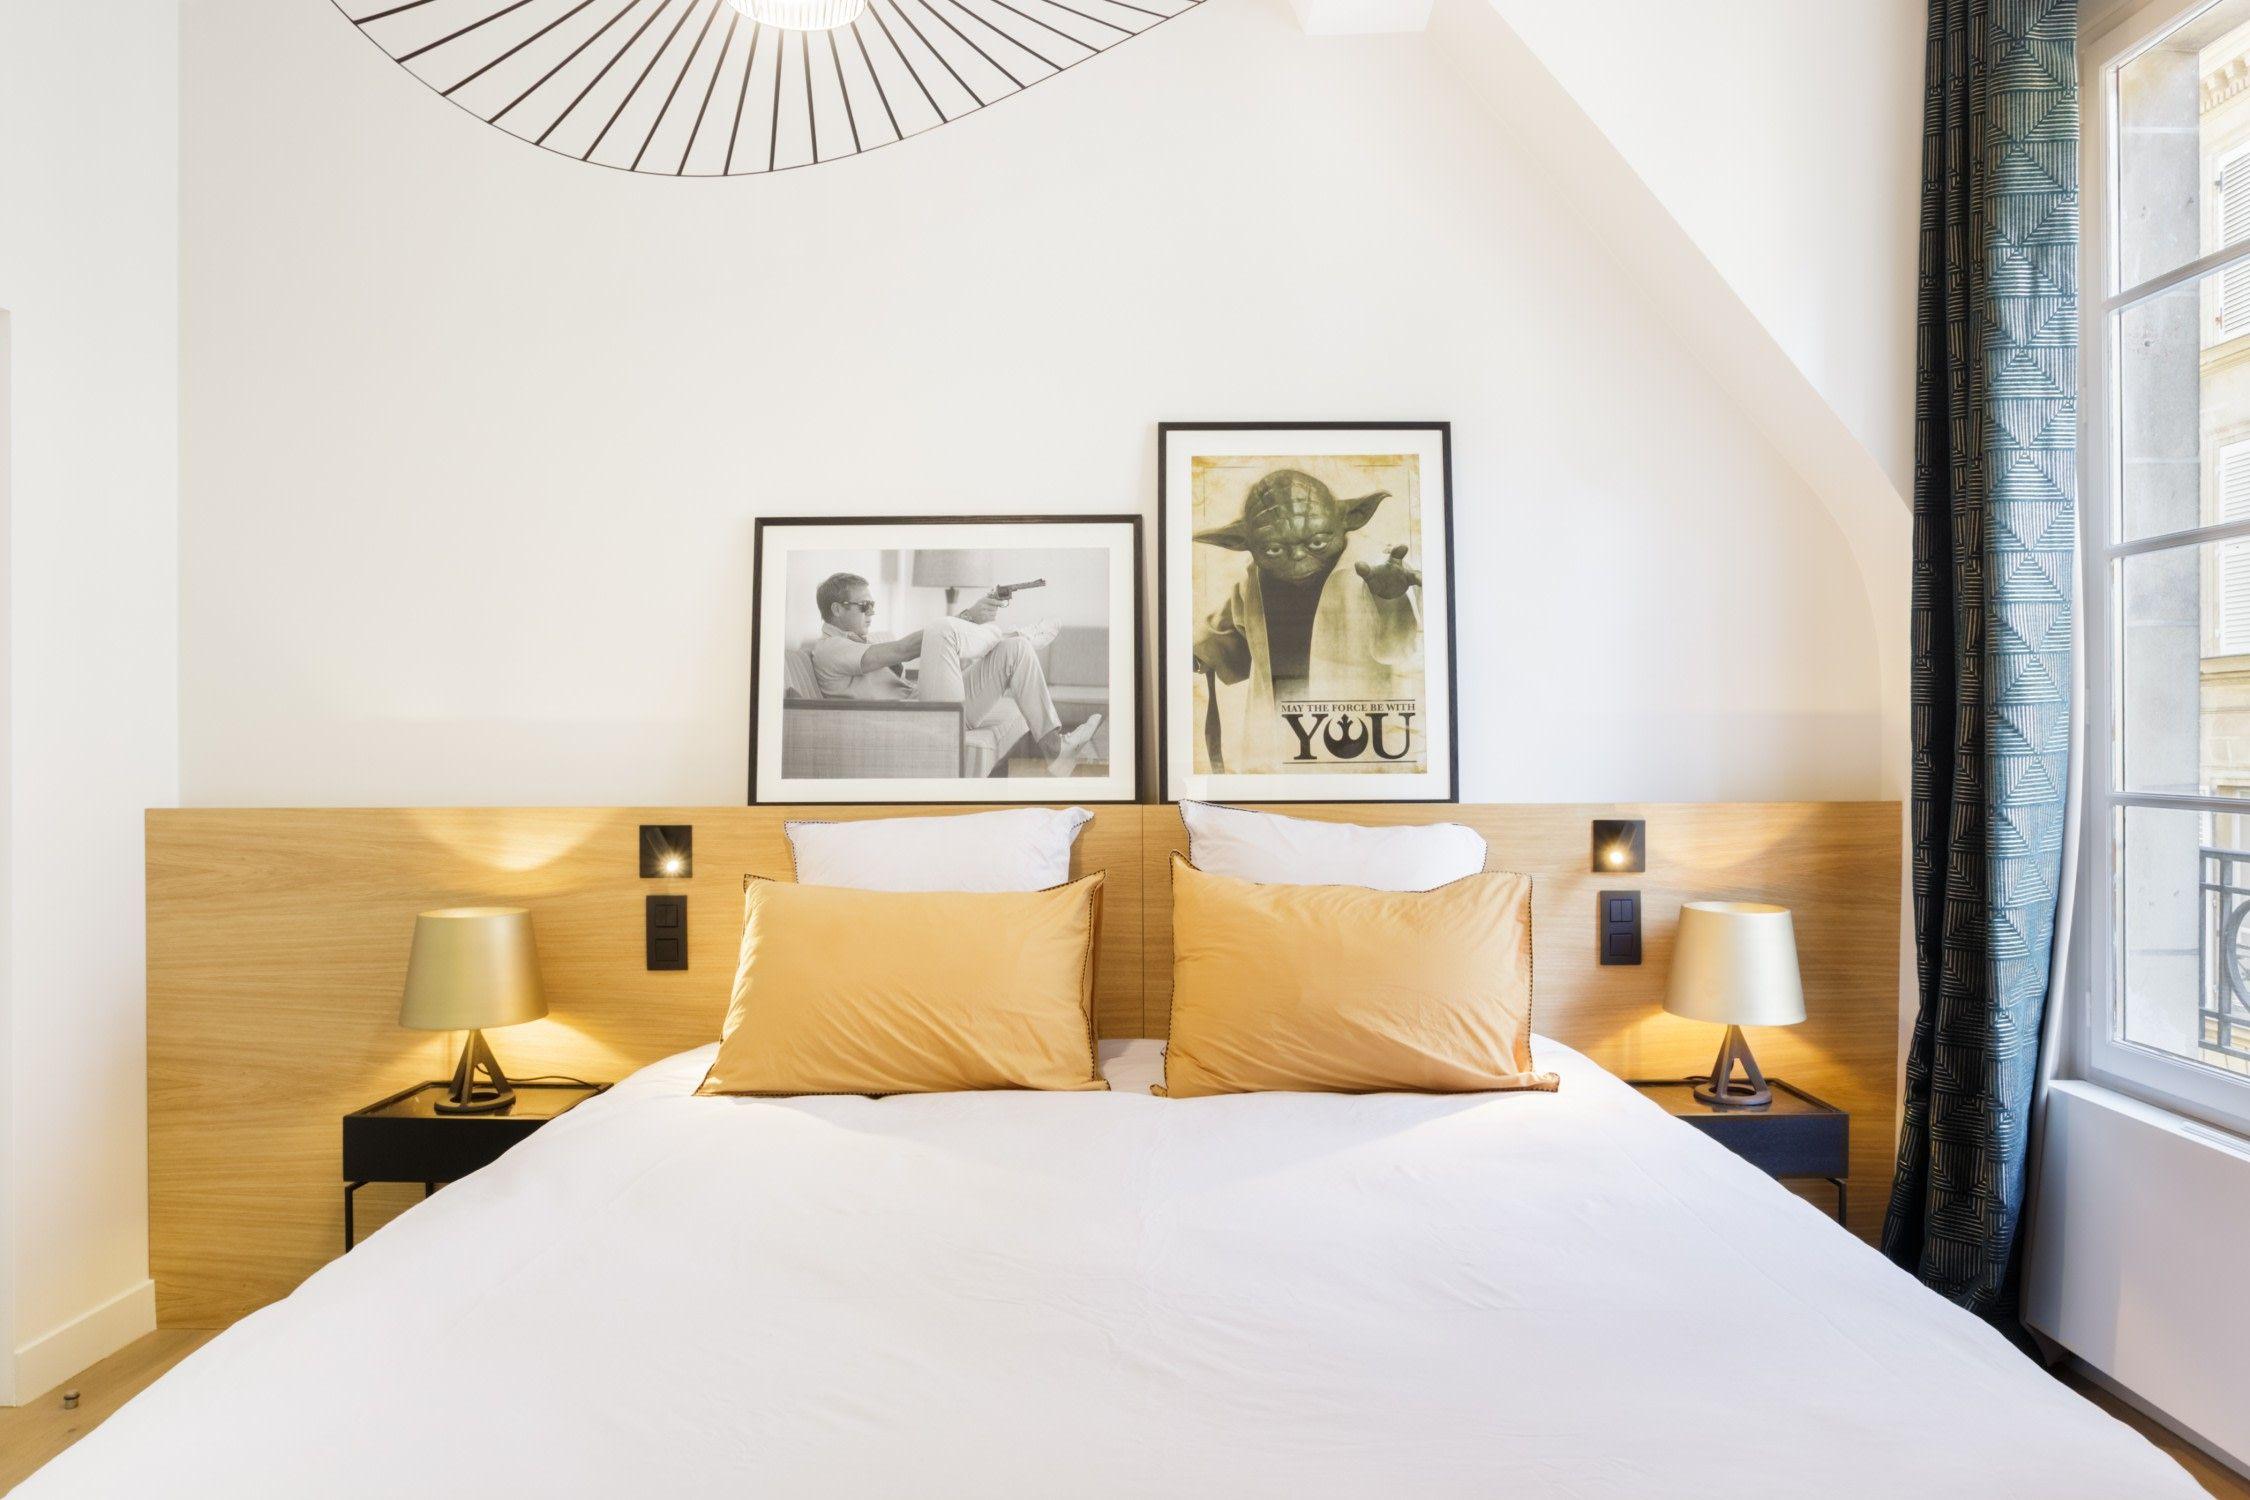 airbnbs versus hotels in paris at every price point wanderlust rh pinterest com